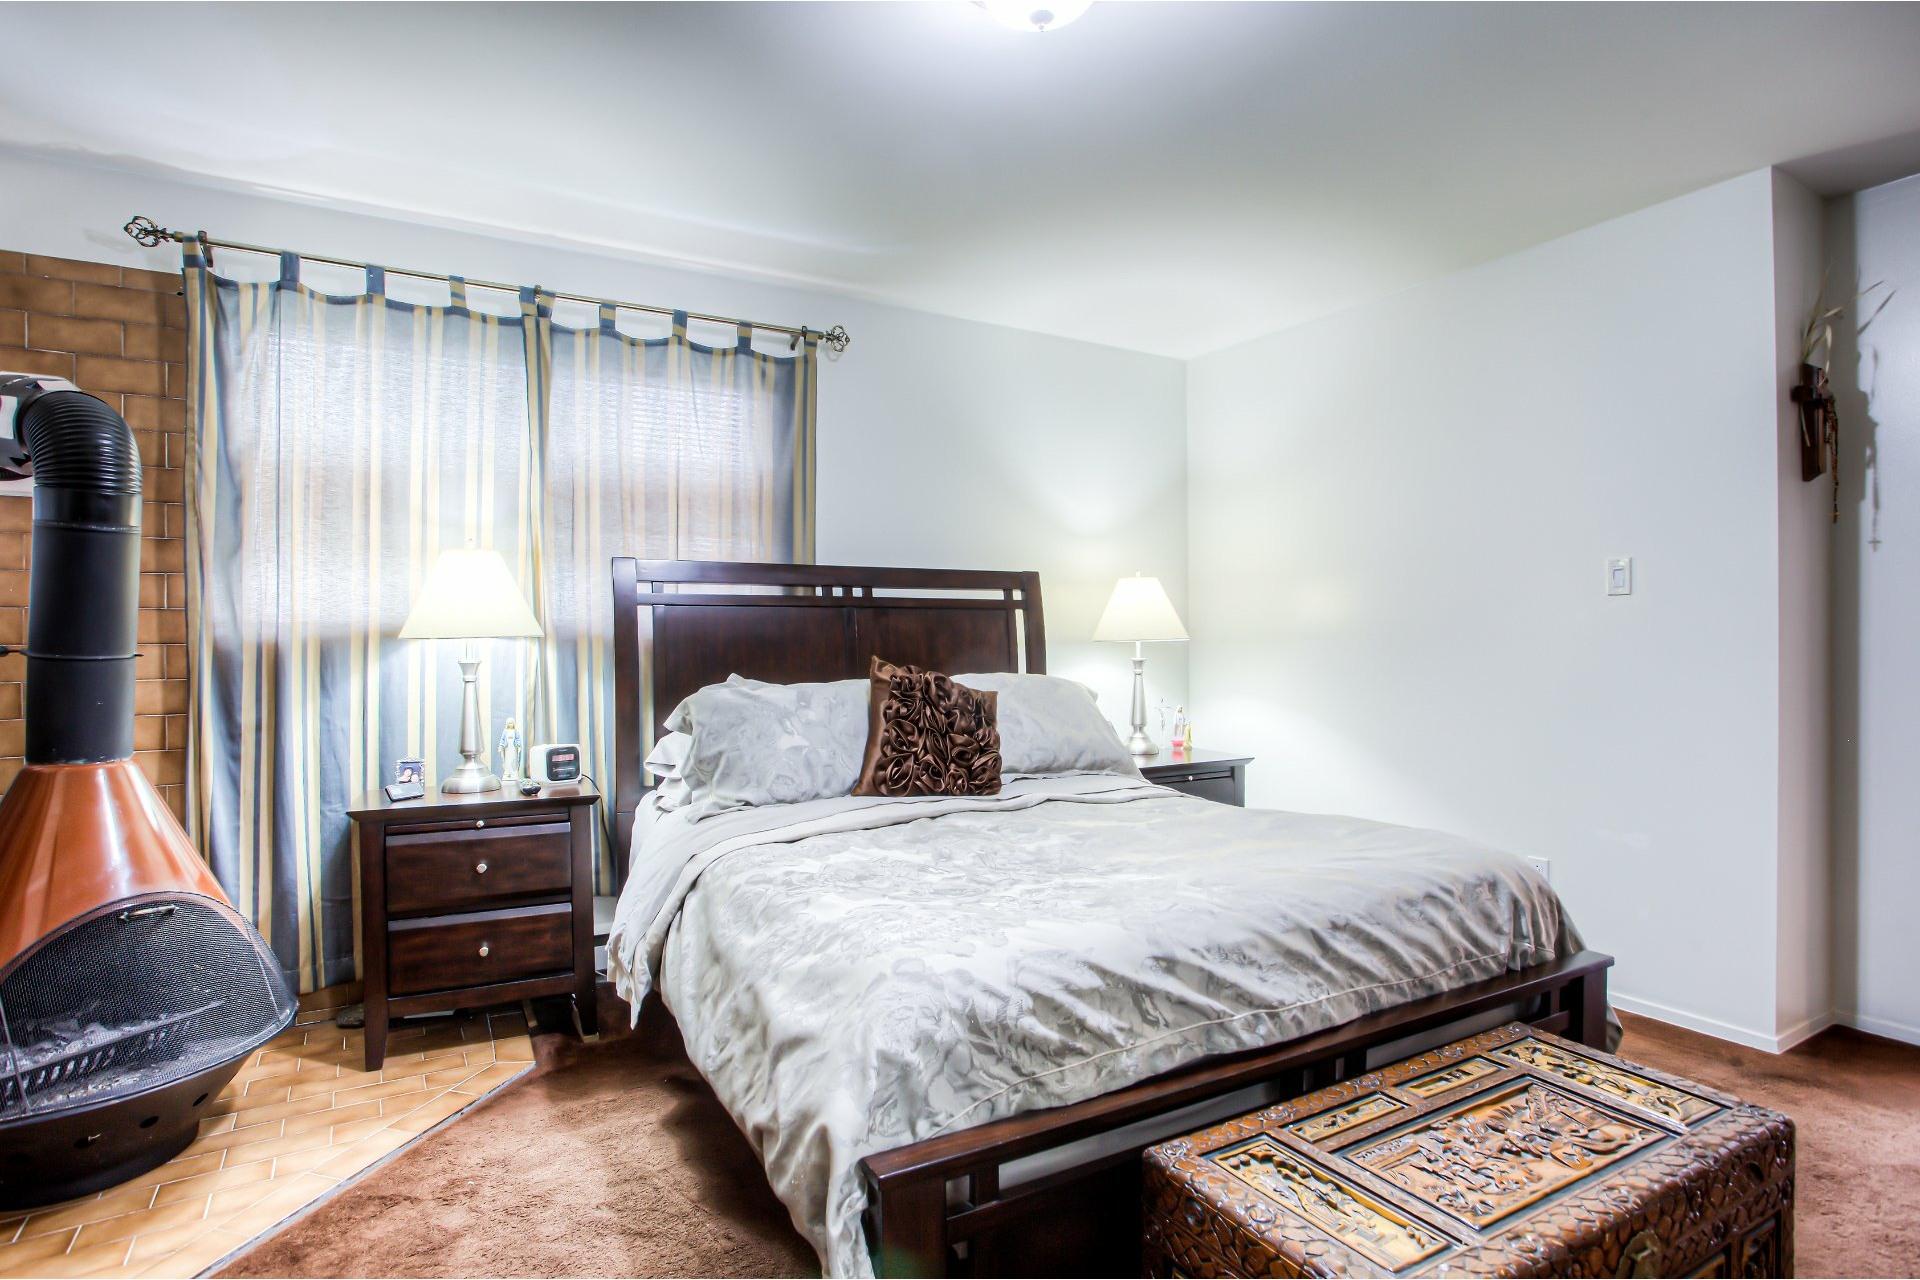 image 10 - MX - Casa sola - MX En venta Dollard-Des Ormeaux - 11 habitaciones